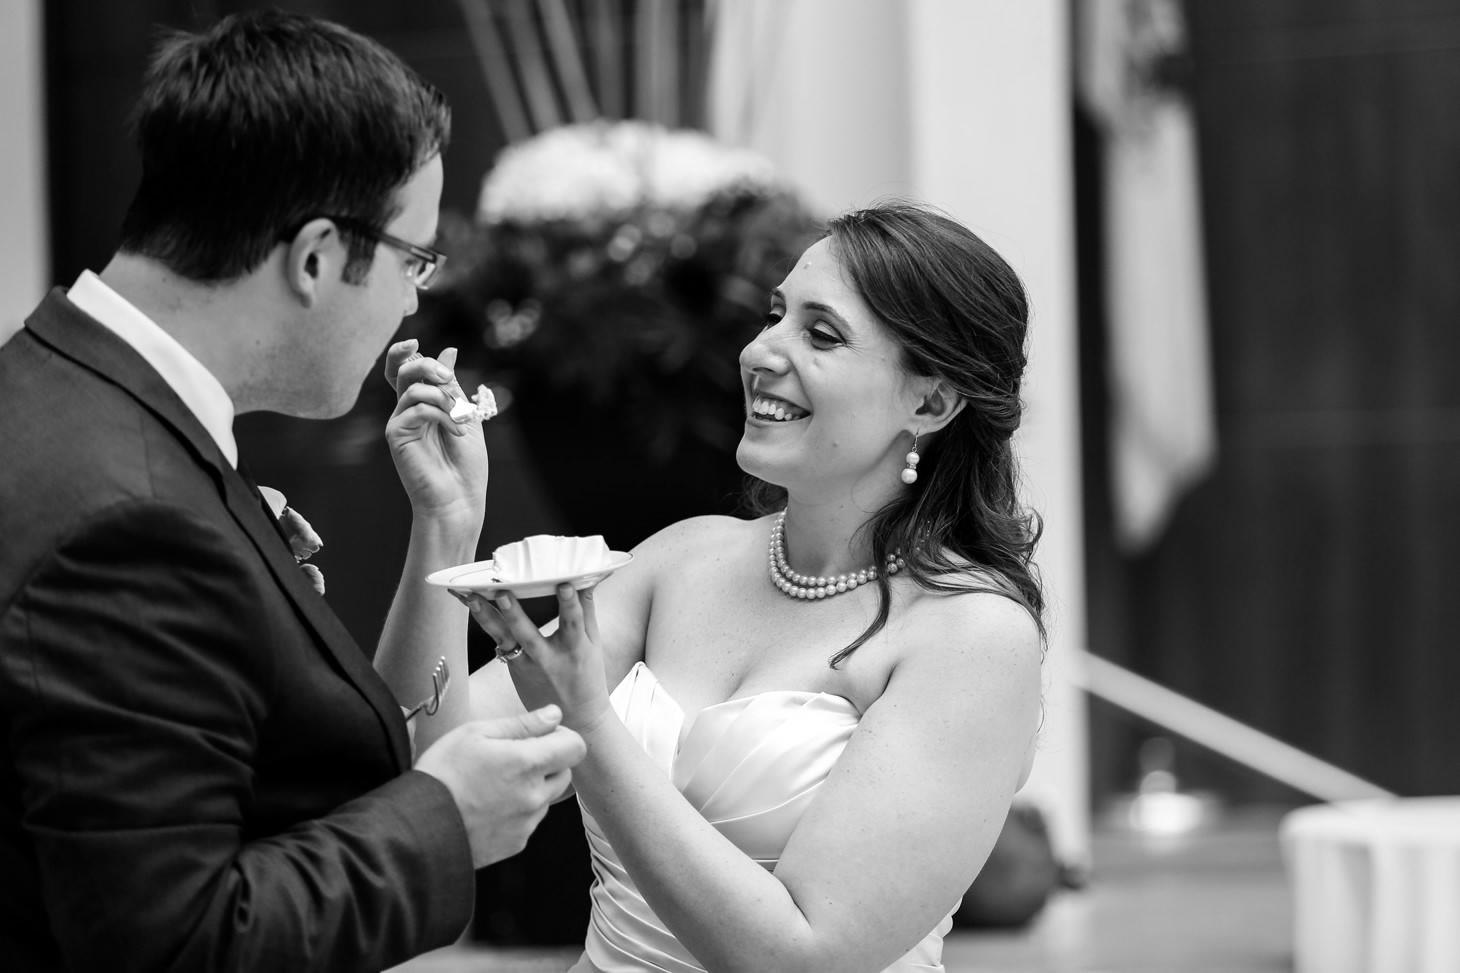 059-nyc-wedding-photographer-hoboken-waterfront-wedding-photos-smitten-chickens.jpg